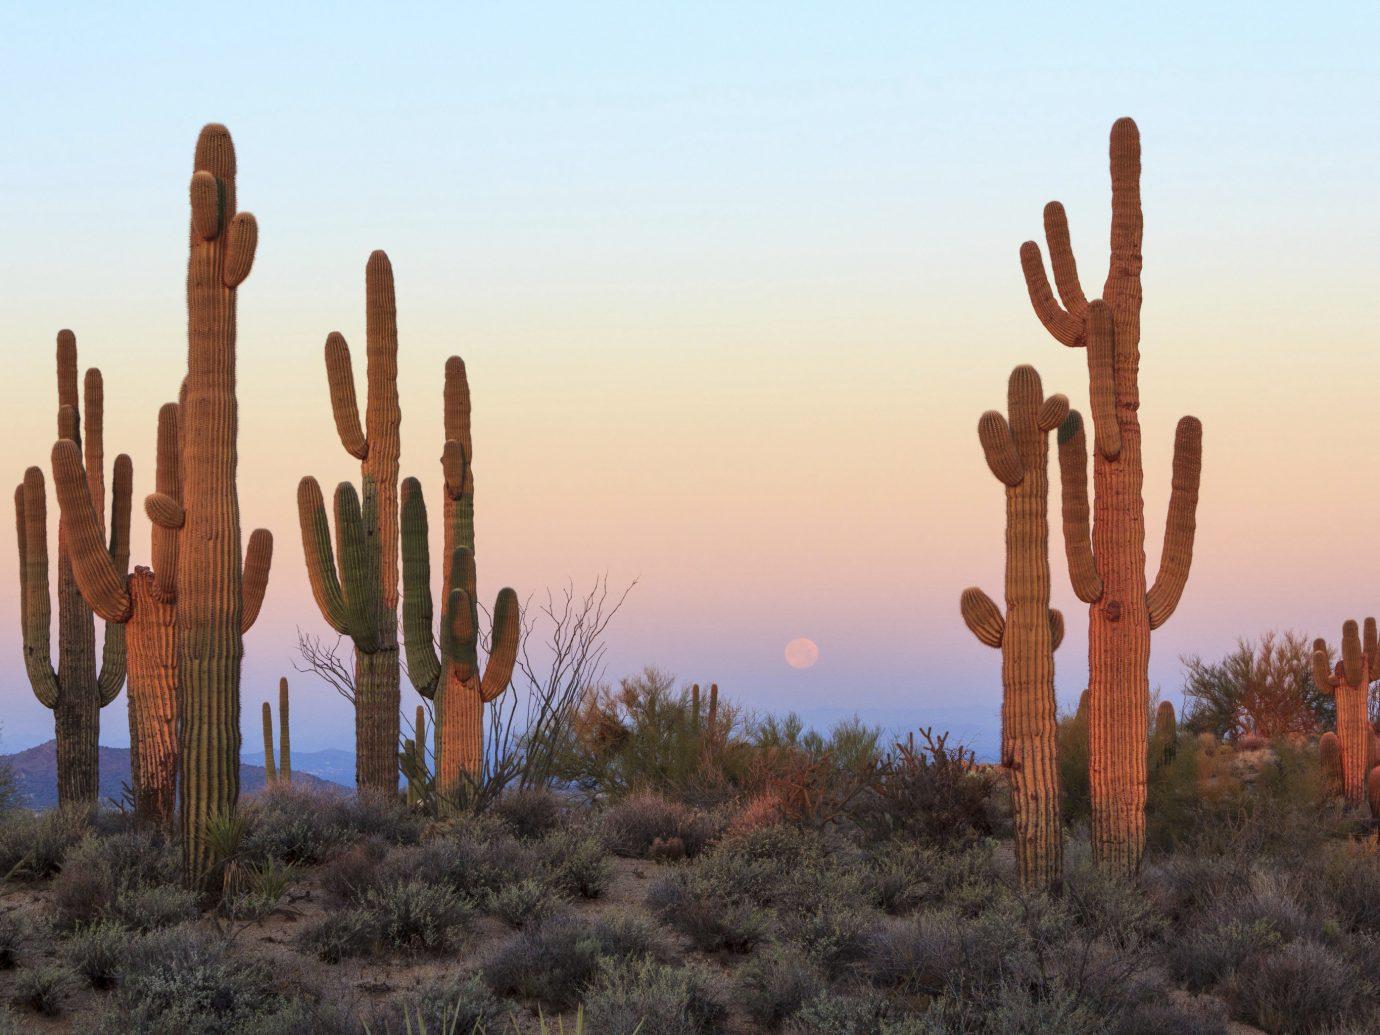 Health + Wellness Hotels Yoga Retreats plant cactus sky outdoor Desert natural environment aeolian landform land plant flowering plant grass family landscape field flower caryophyllales Sunset sand several